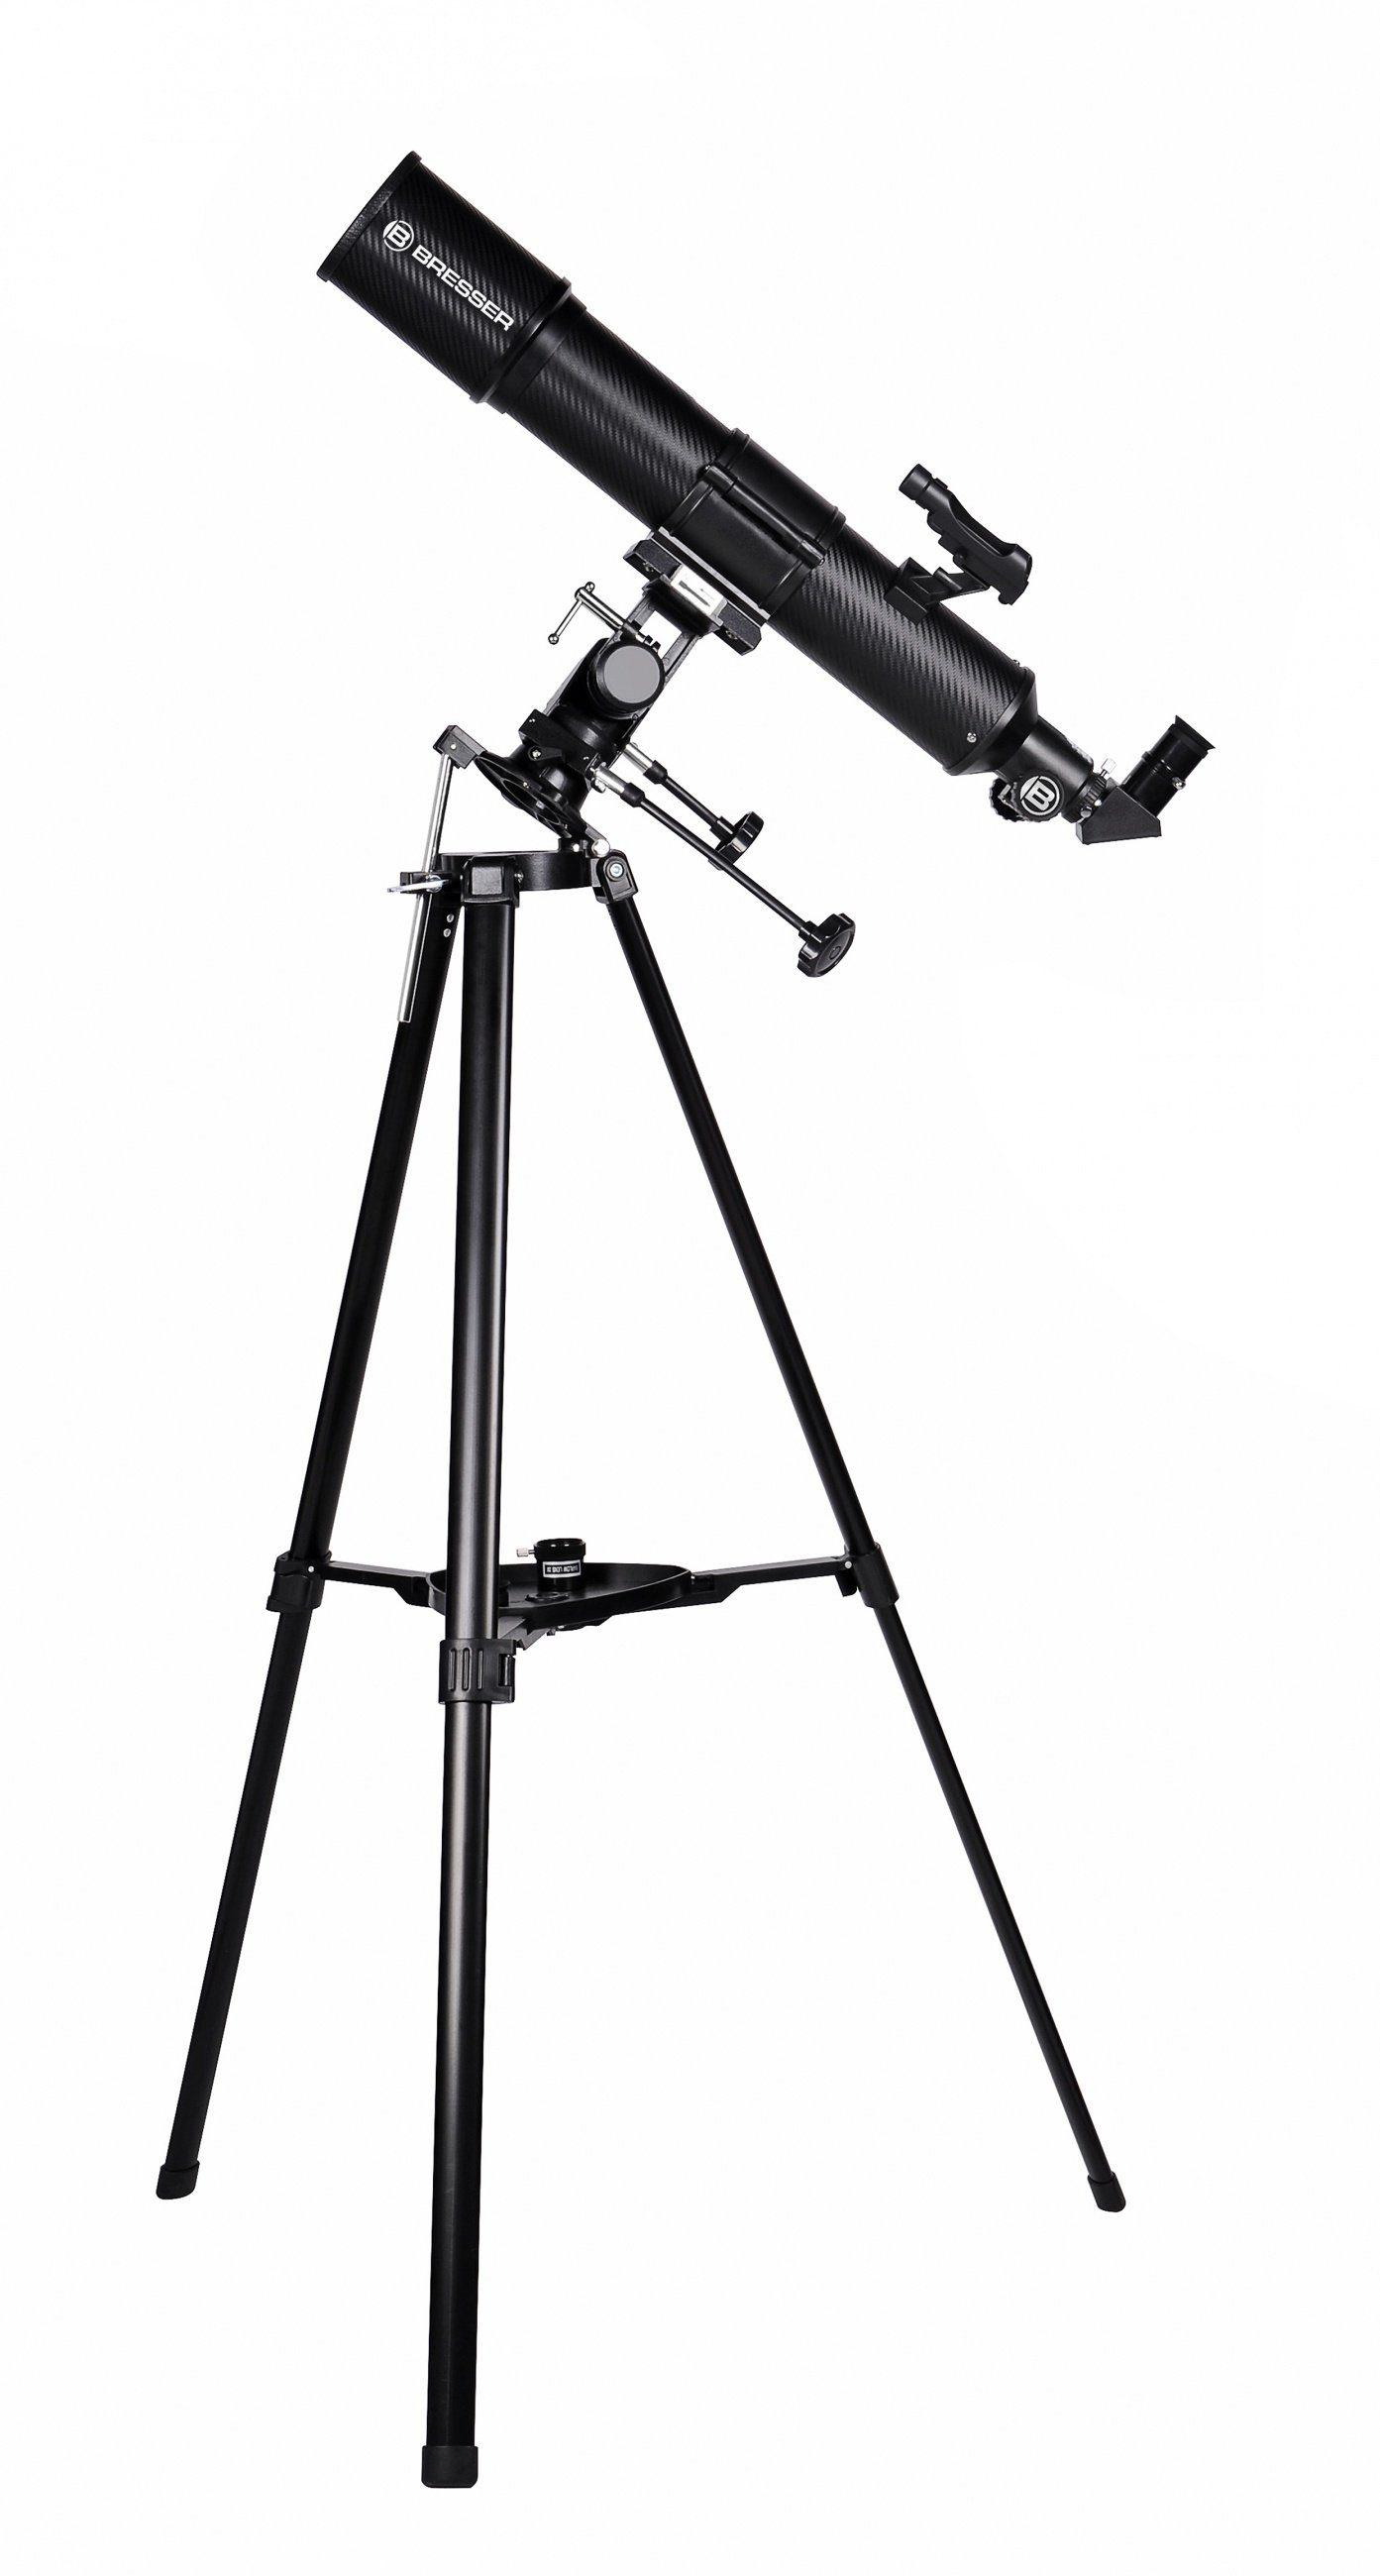 Bresser Teleskop »Taurus 90/500 NG Linsenteleskop mit Handy Adapter«